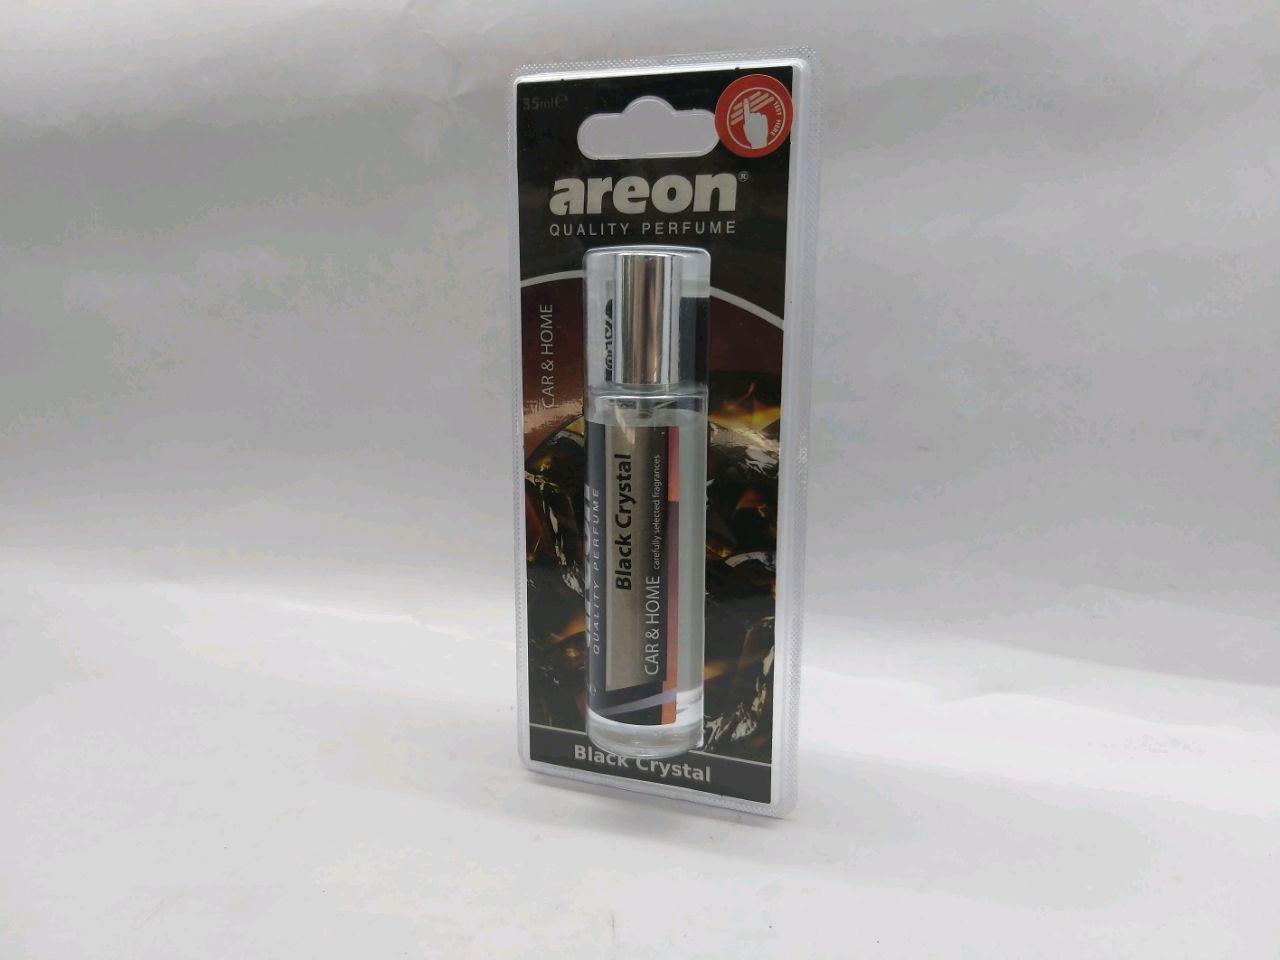 Aromatizator Areon Mini sprey 35ml Black Crystal